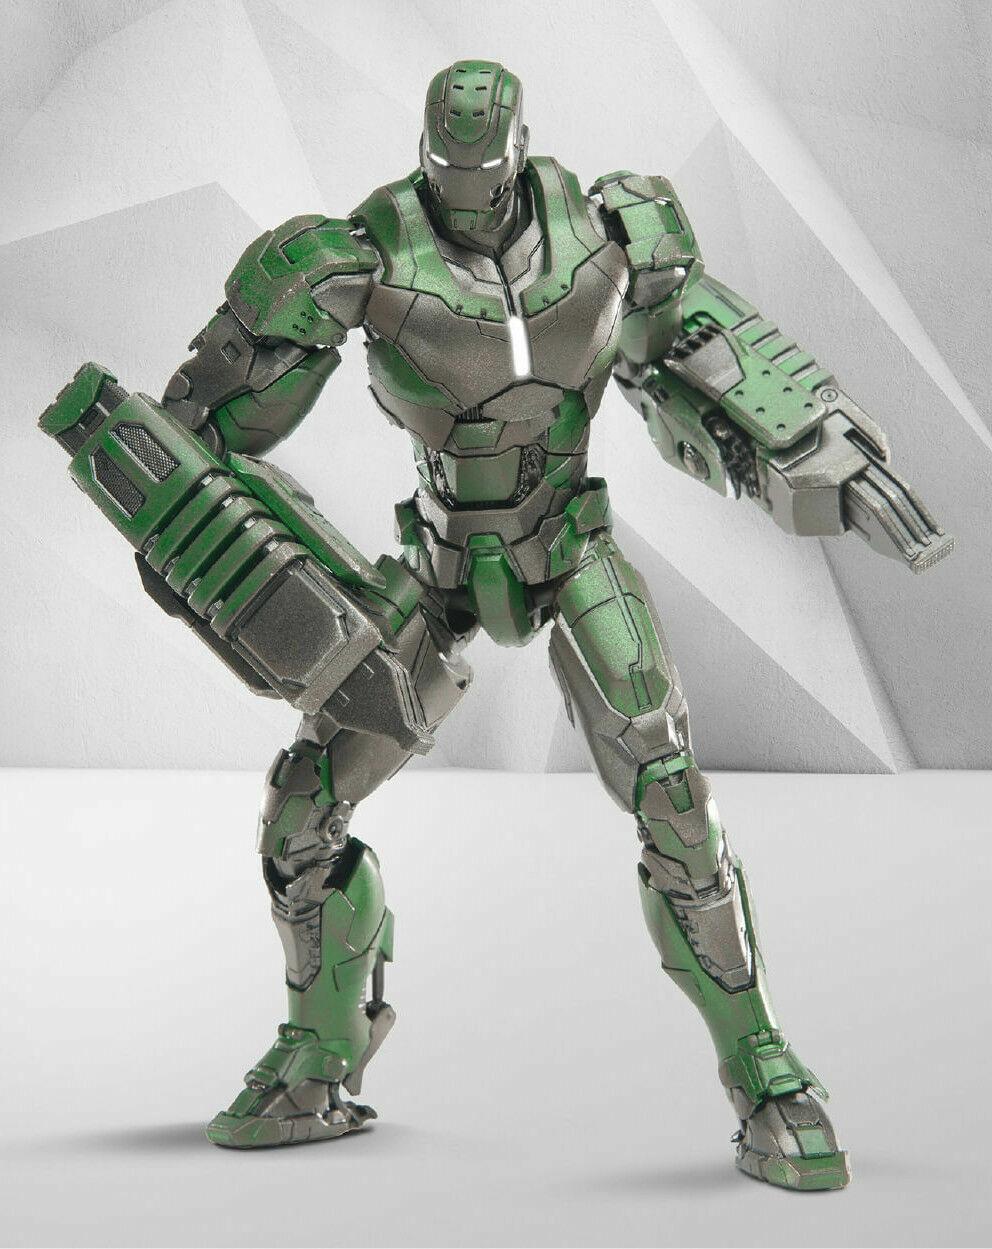 1 12th Metal Diecast Iron Man MK26 comicave Studios Gamma 6  Figura Modelo Muñeca